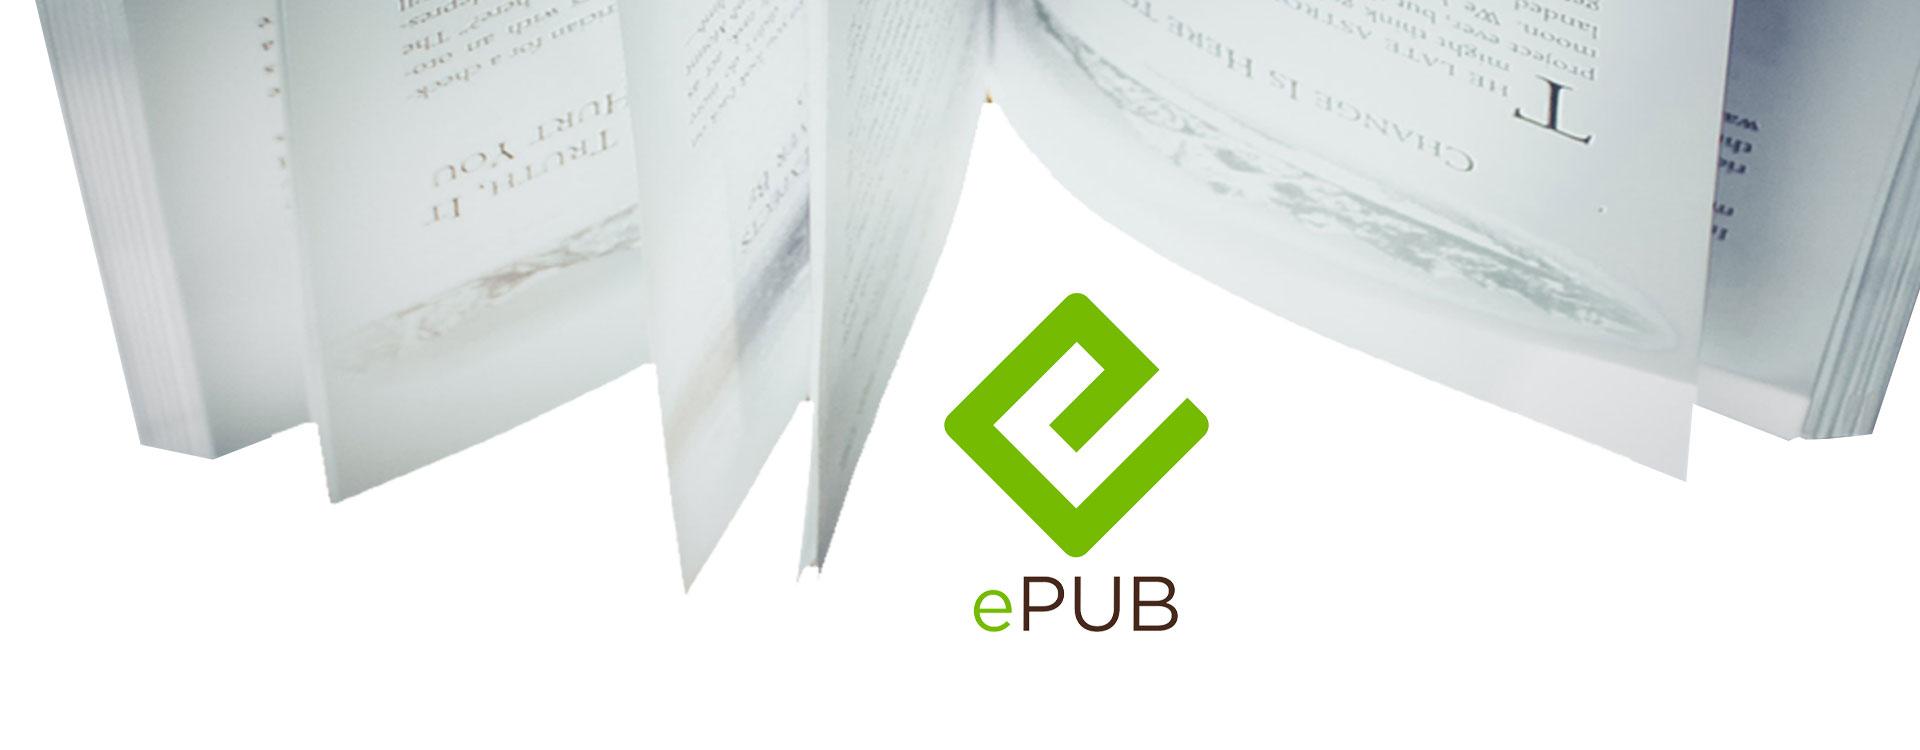 Reflowable ePUB met InDesign